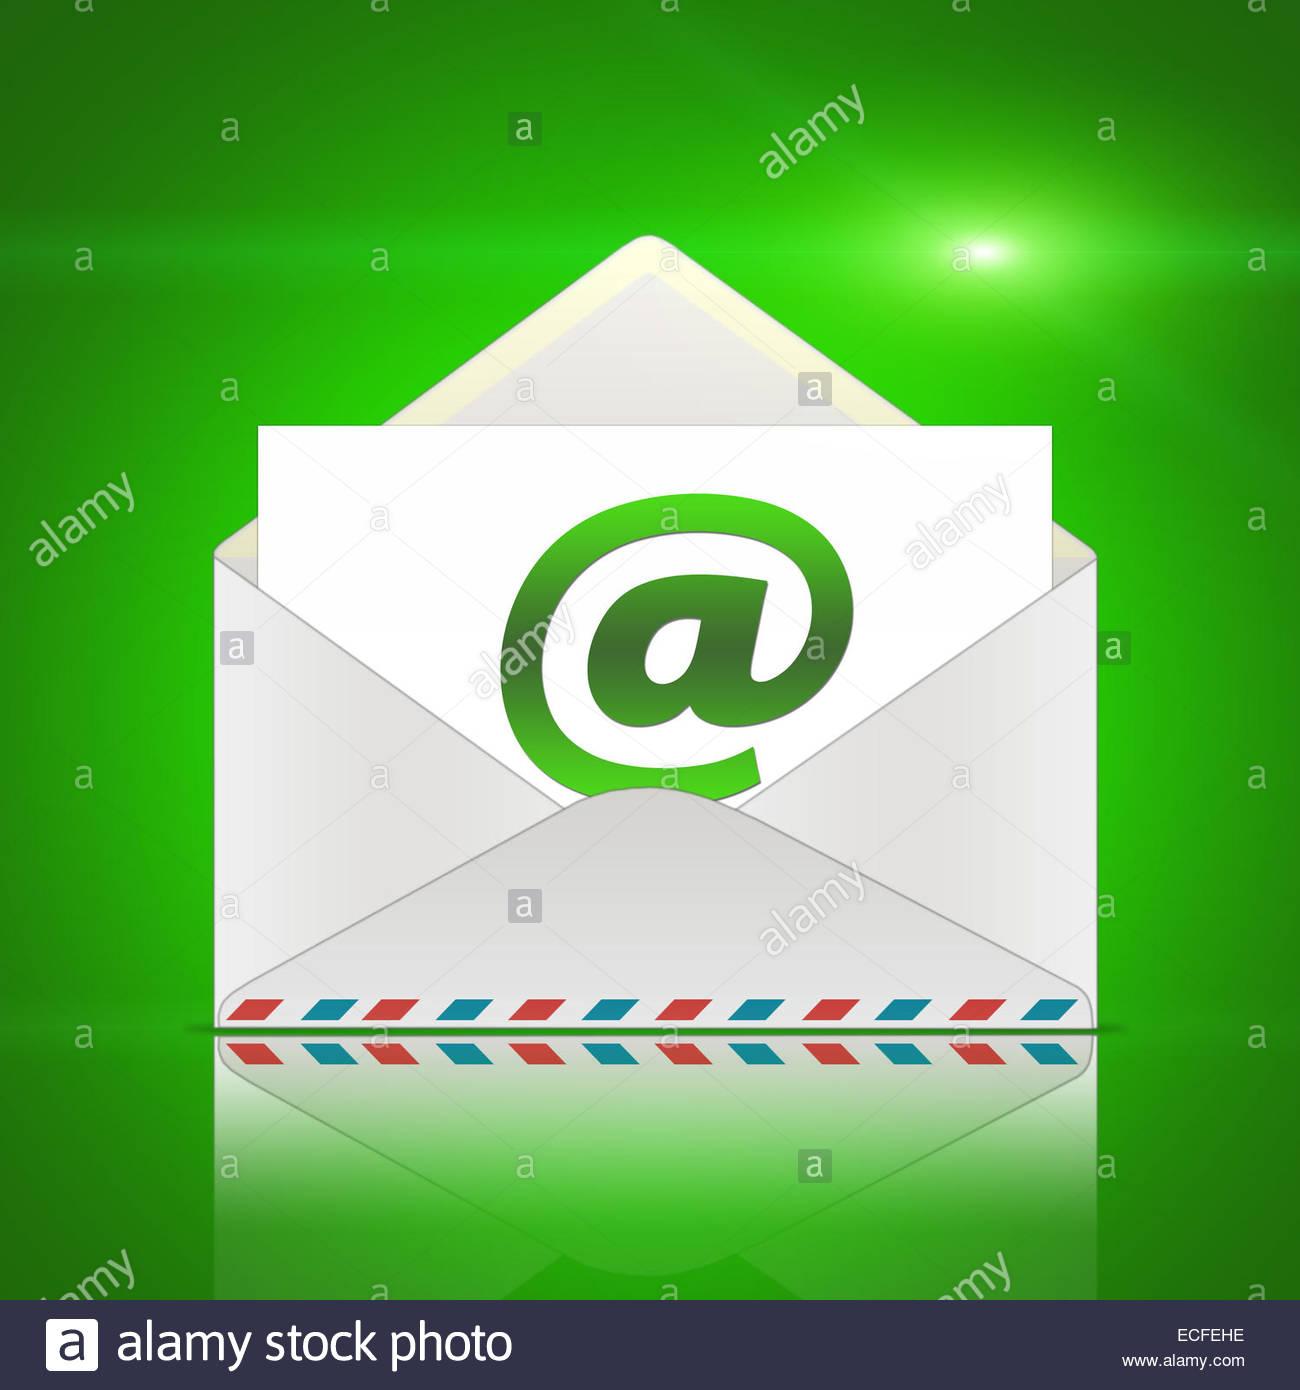 E-Mail envelope - message - Stock Image